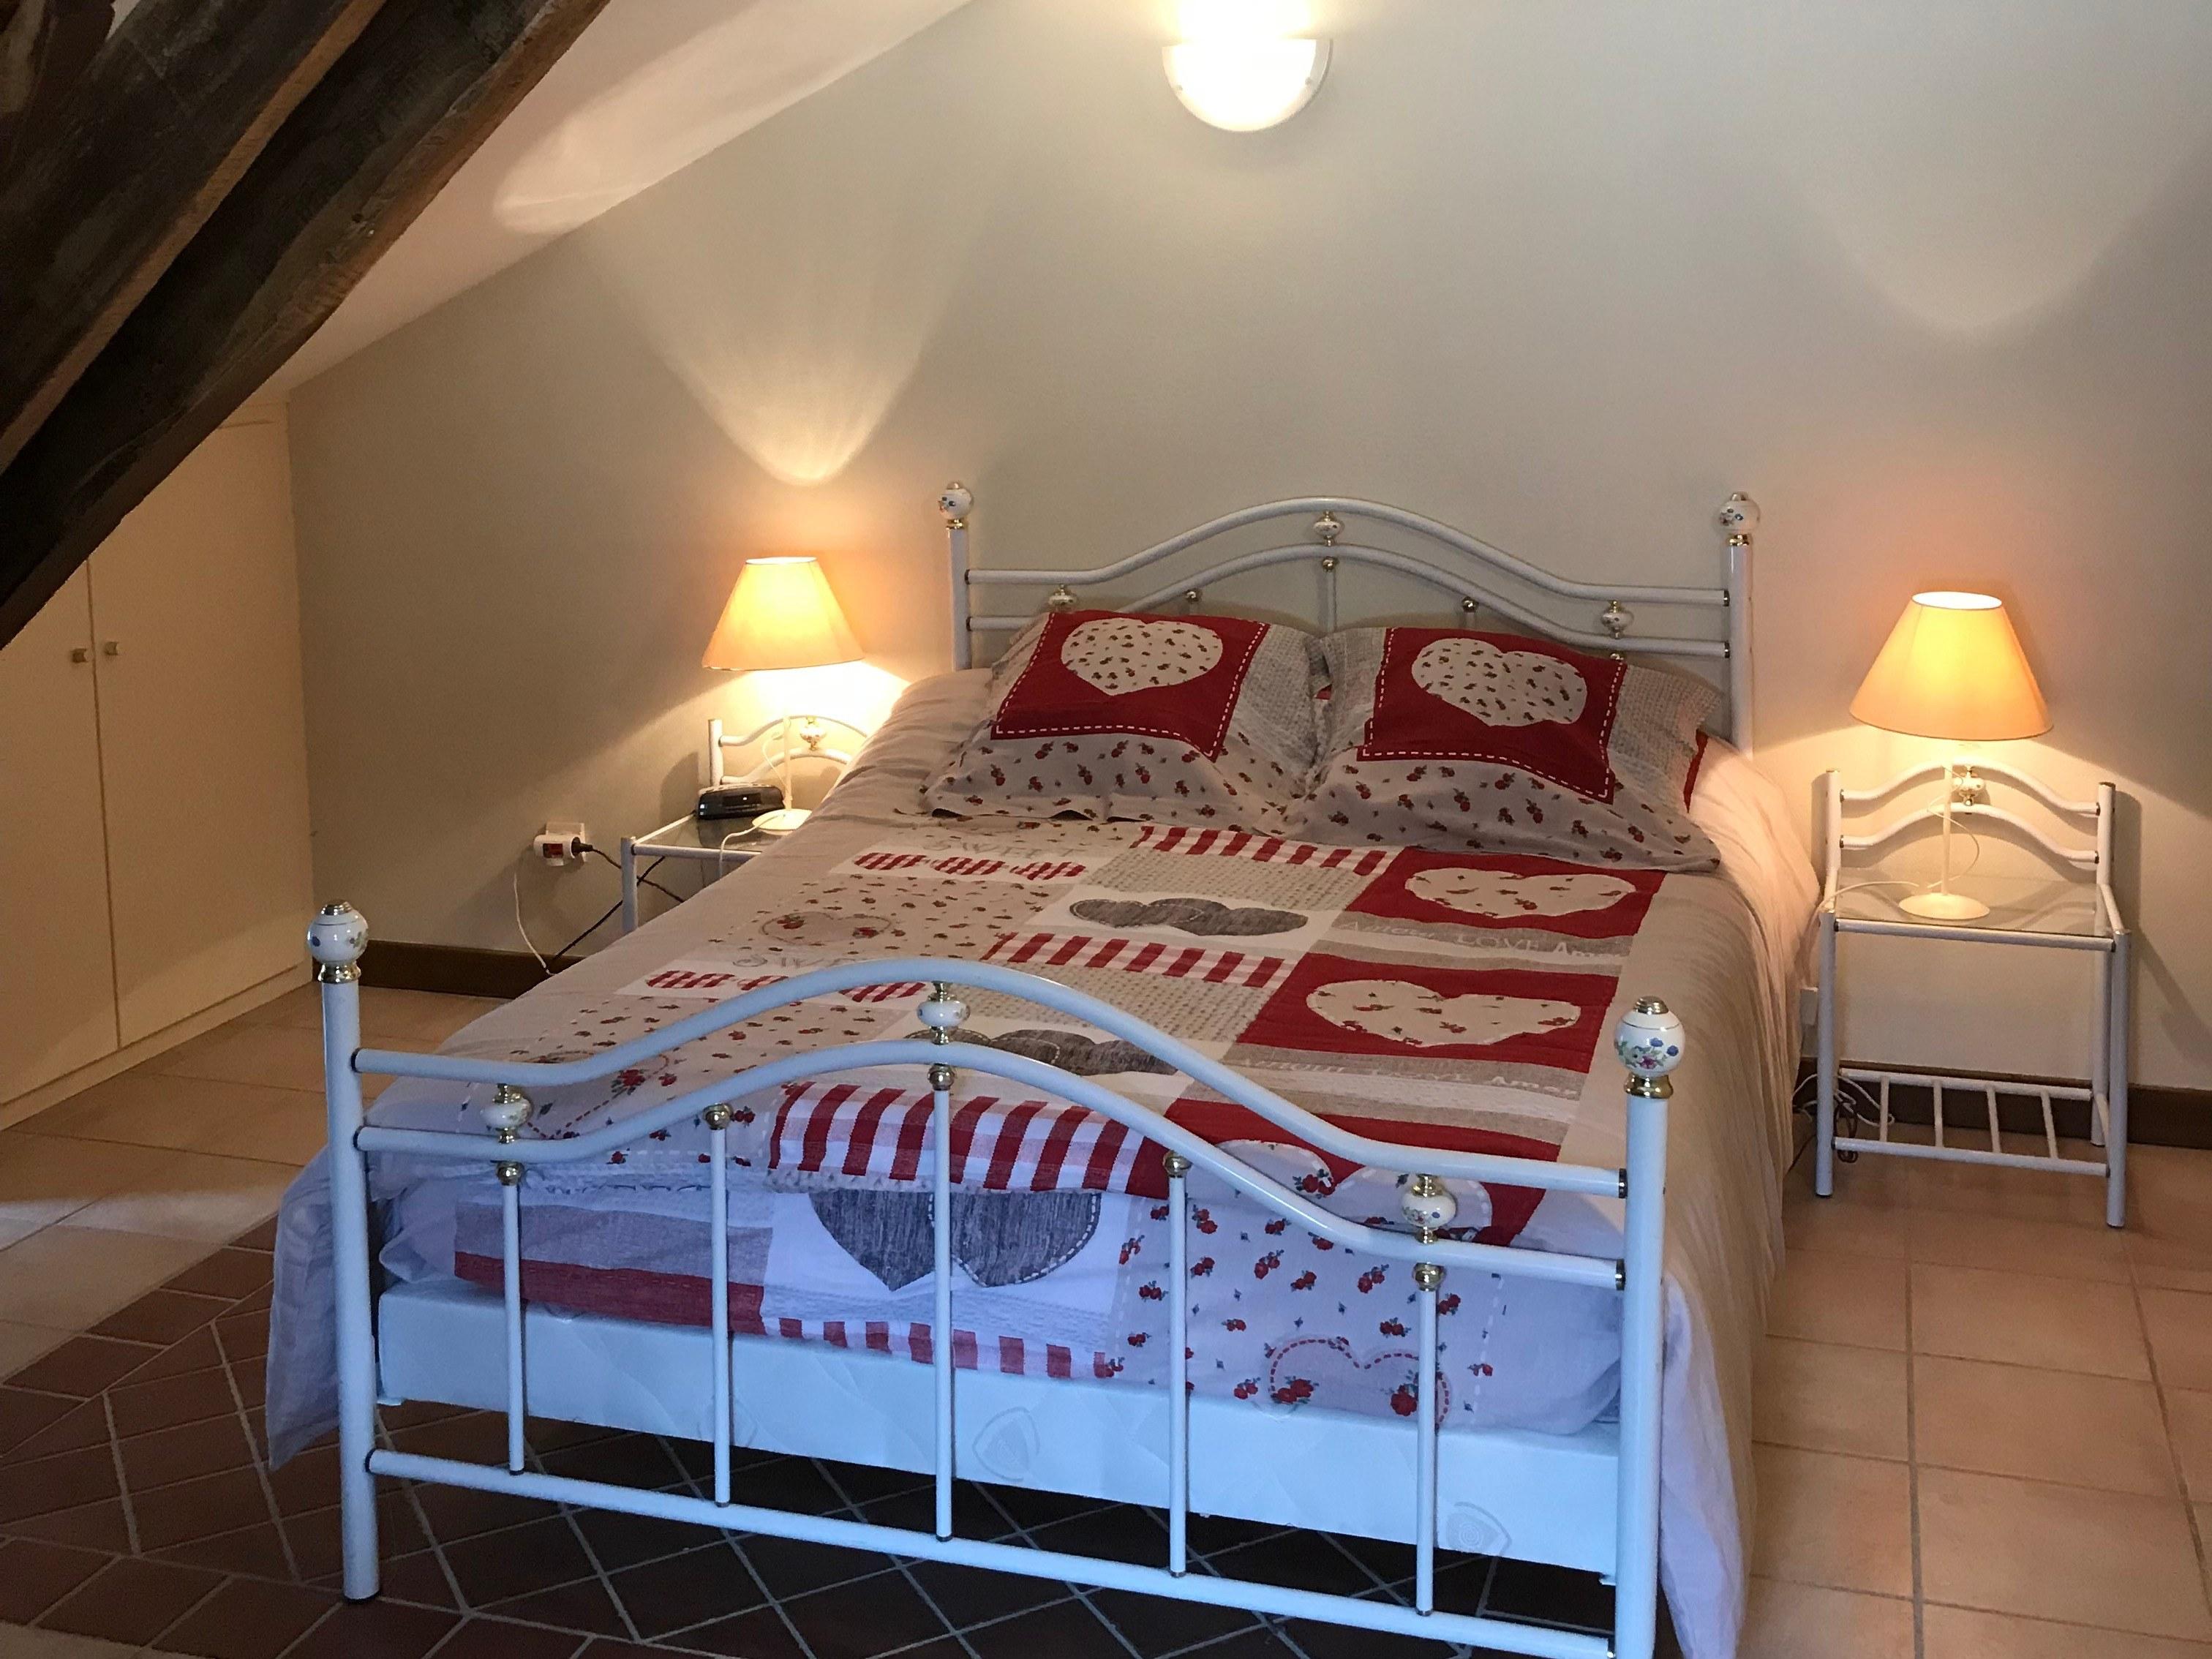 baroville-champagne-lit-double-chambre-lampe-chevet